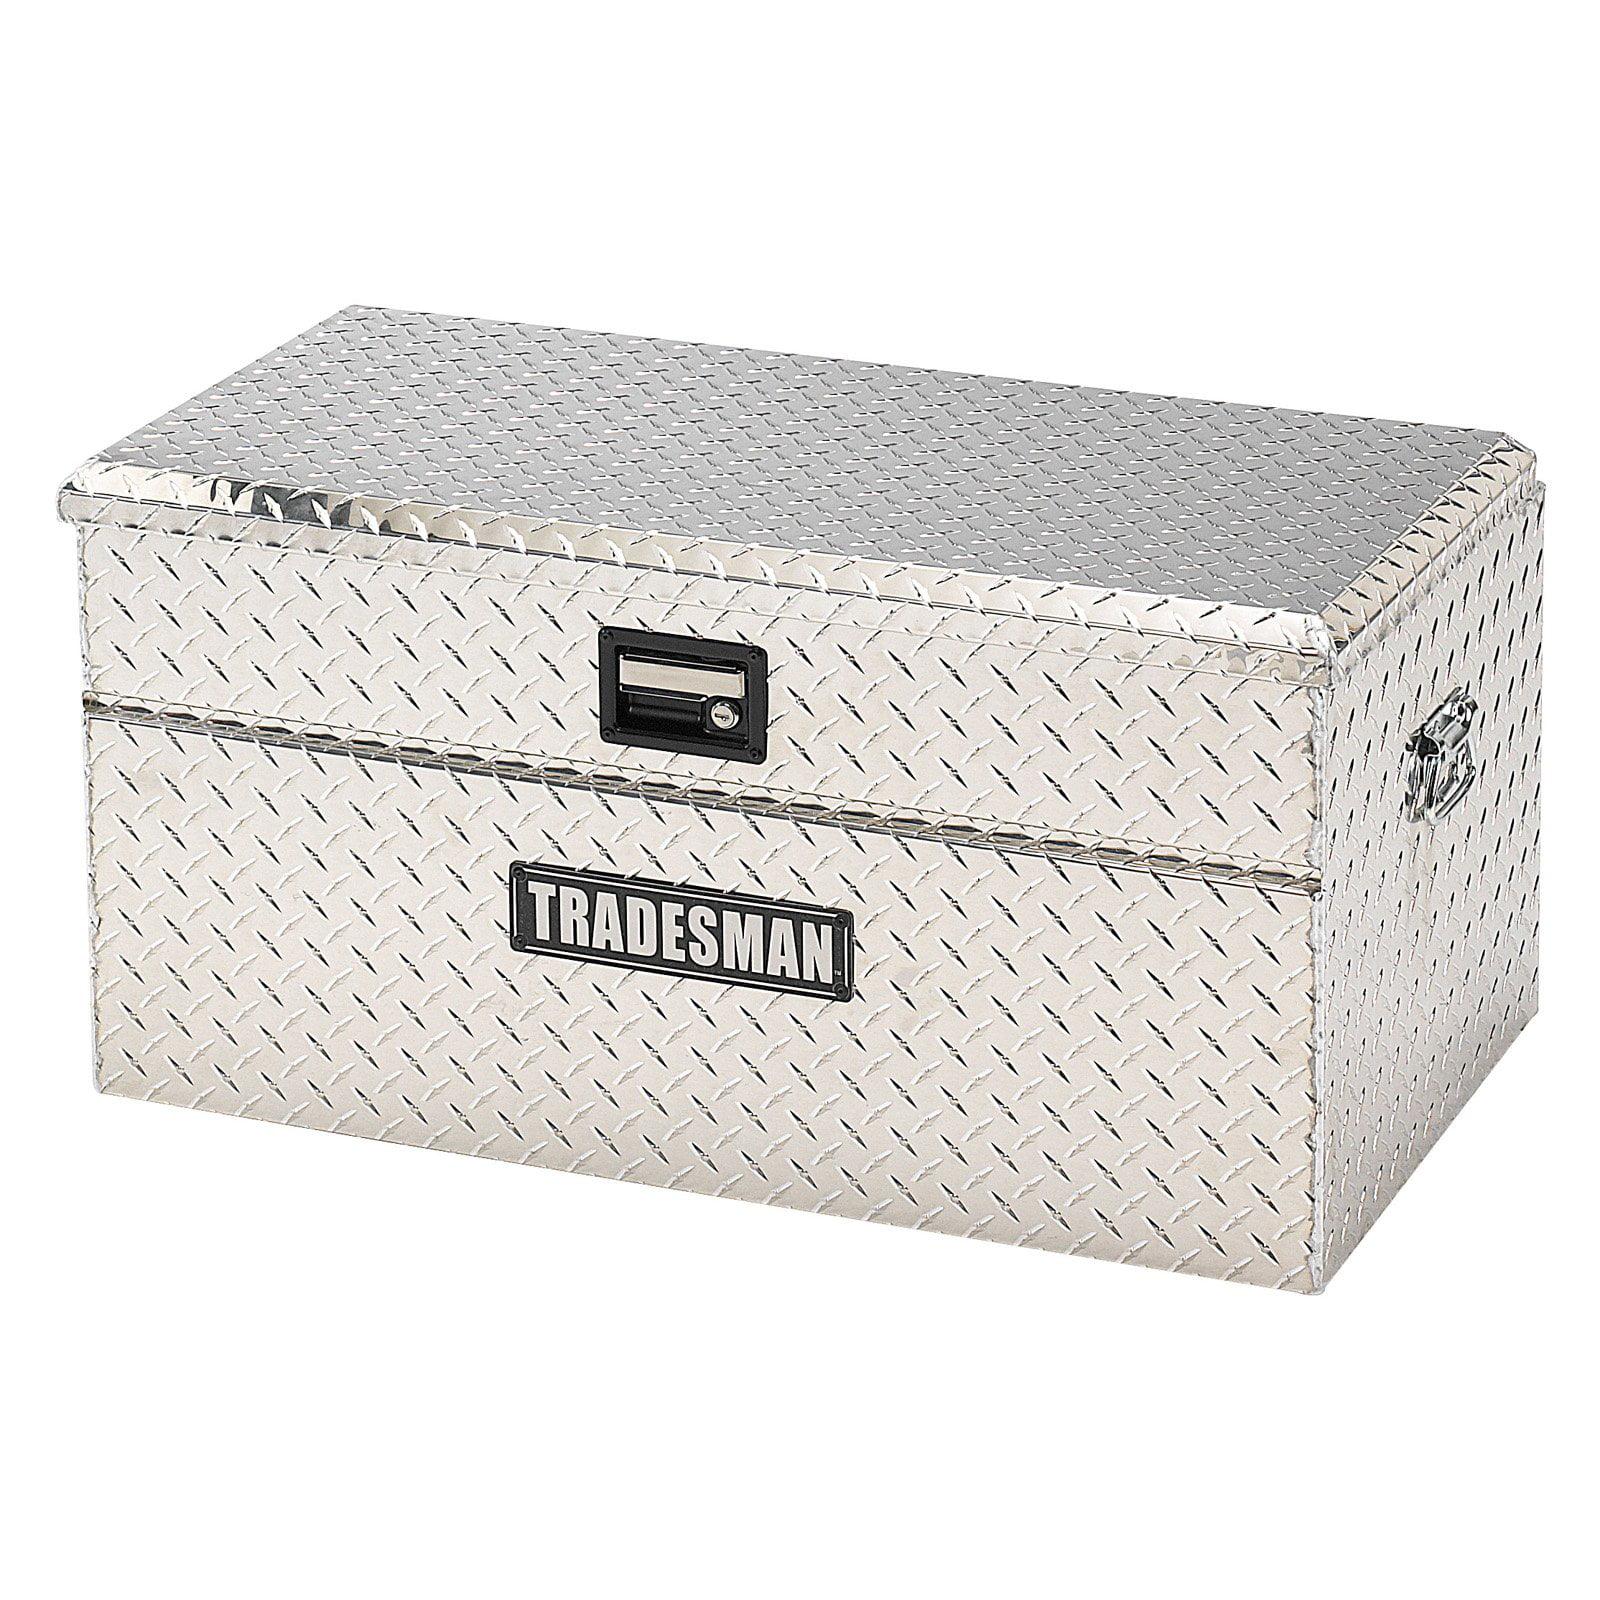 Tradesman Small Size Single Lid Flush Mount Truck Tool Box